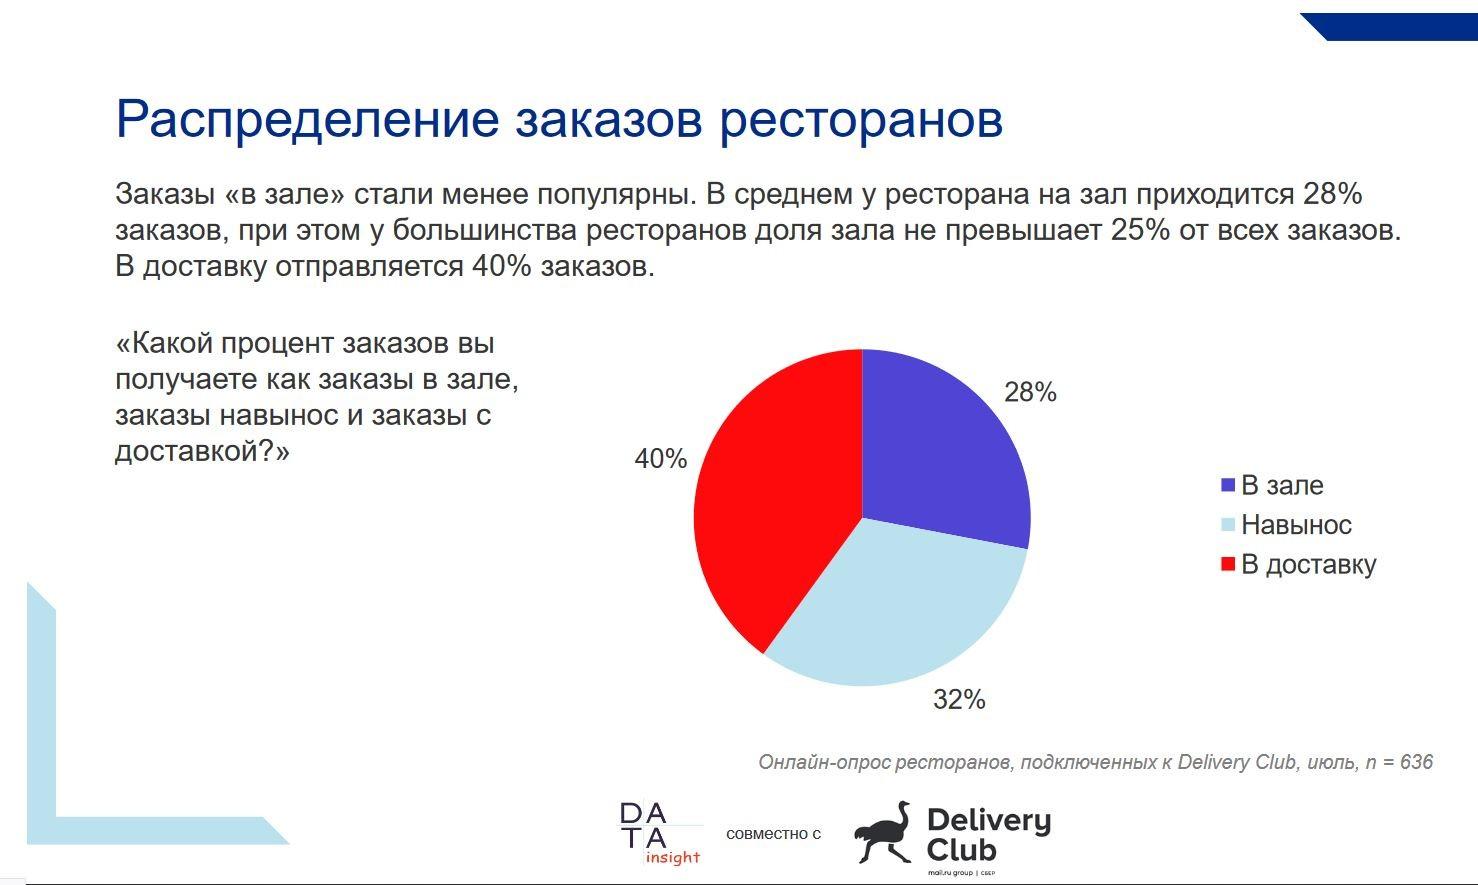 postcovid restaurants russia delivery type